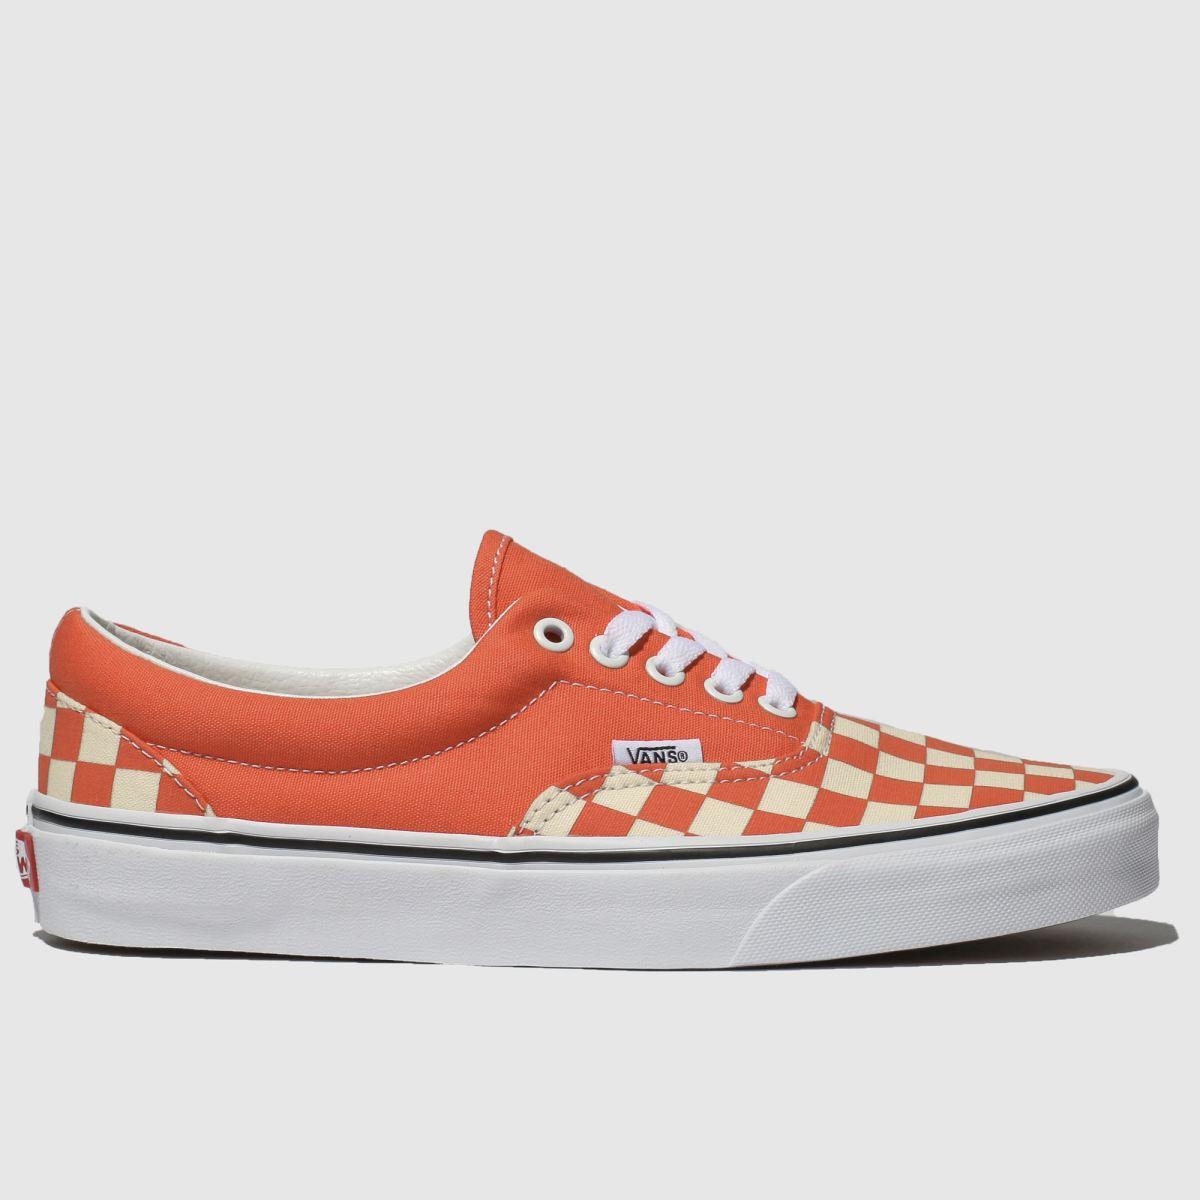 Vans Orange Era Checkerboard Trainers